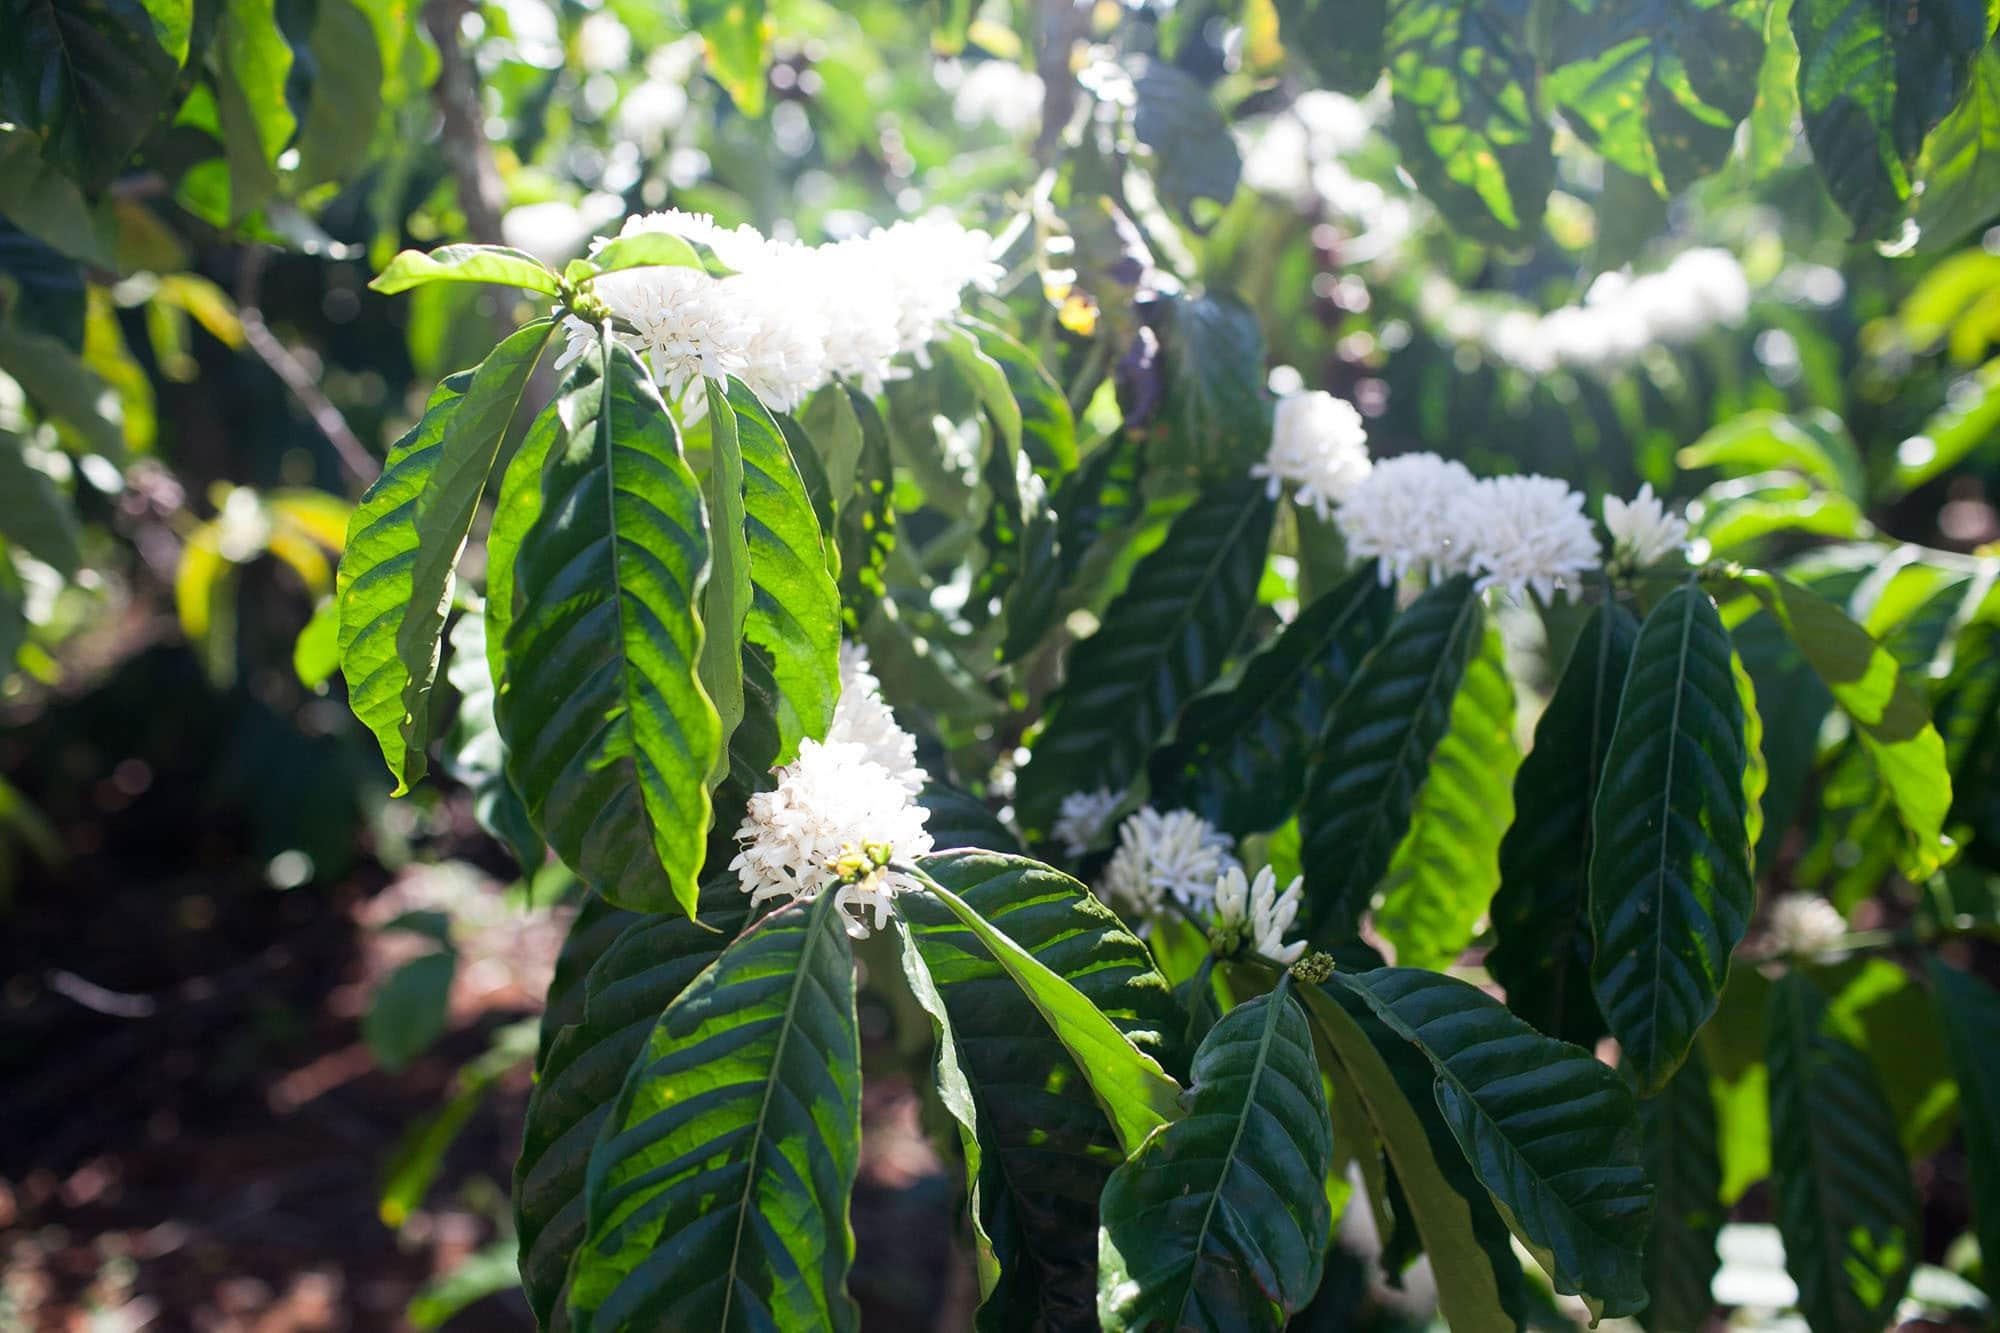 Coffee plants in Dalat, Vietnam - Dalat Countryside Tour in Vietnam